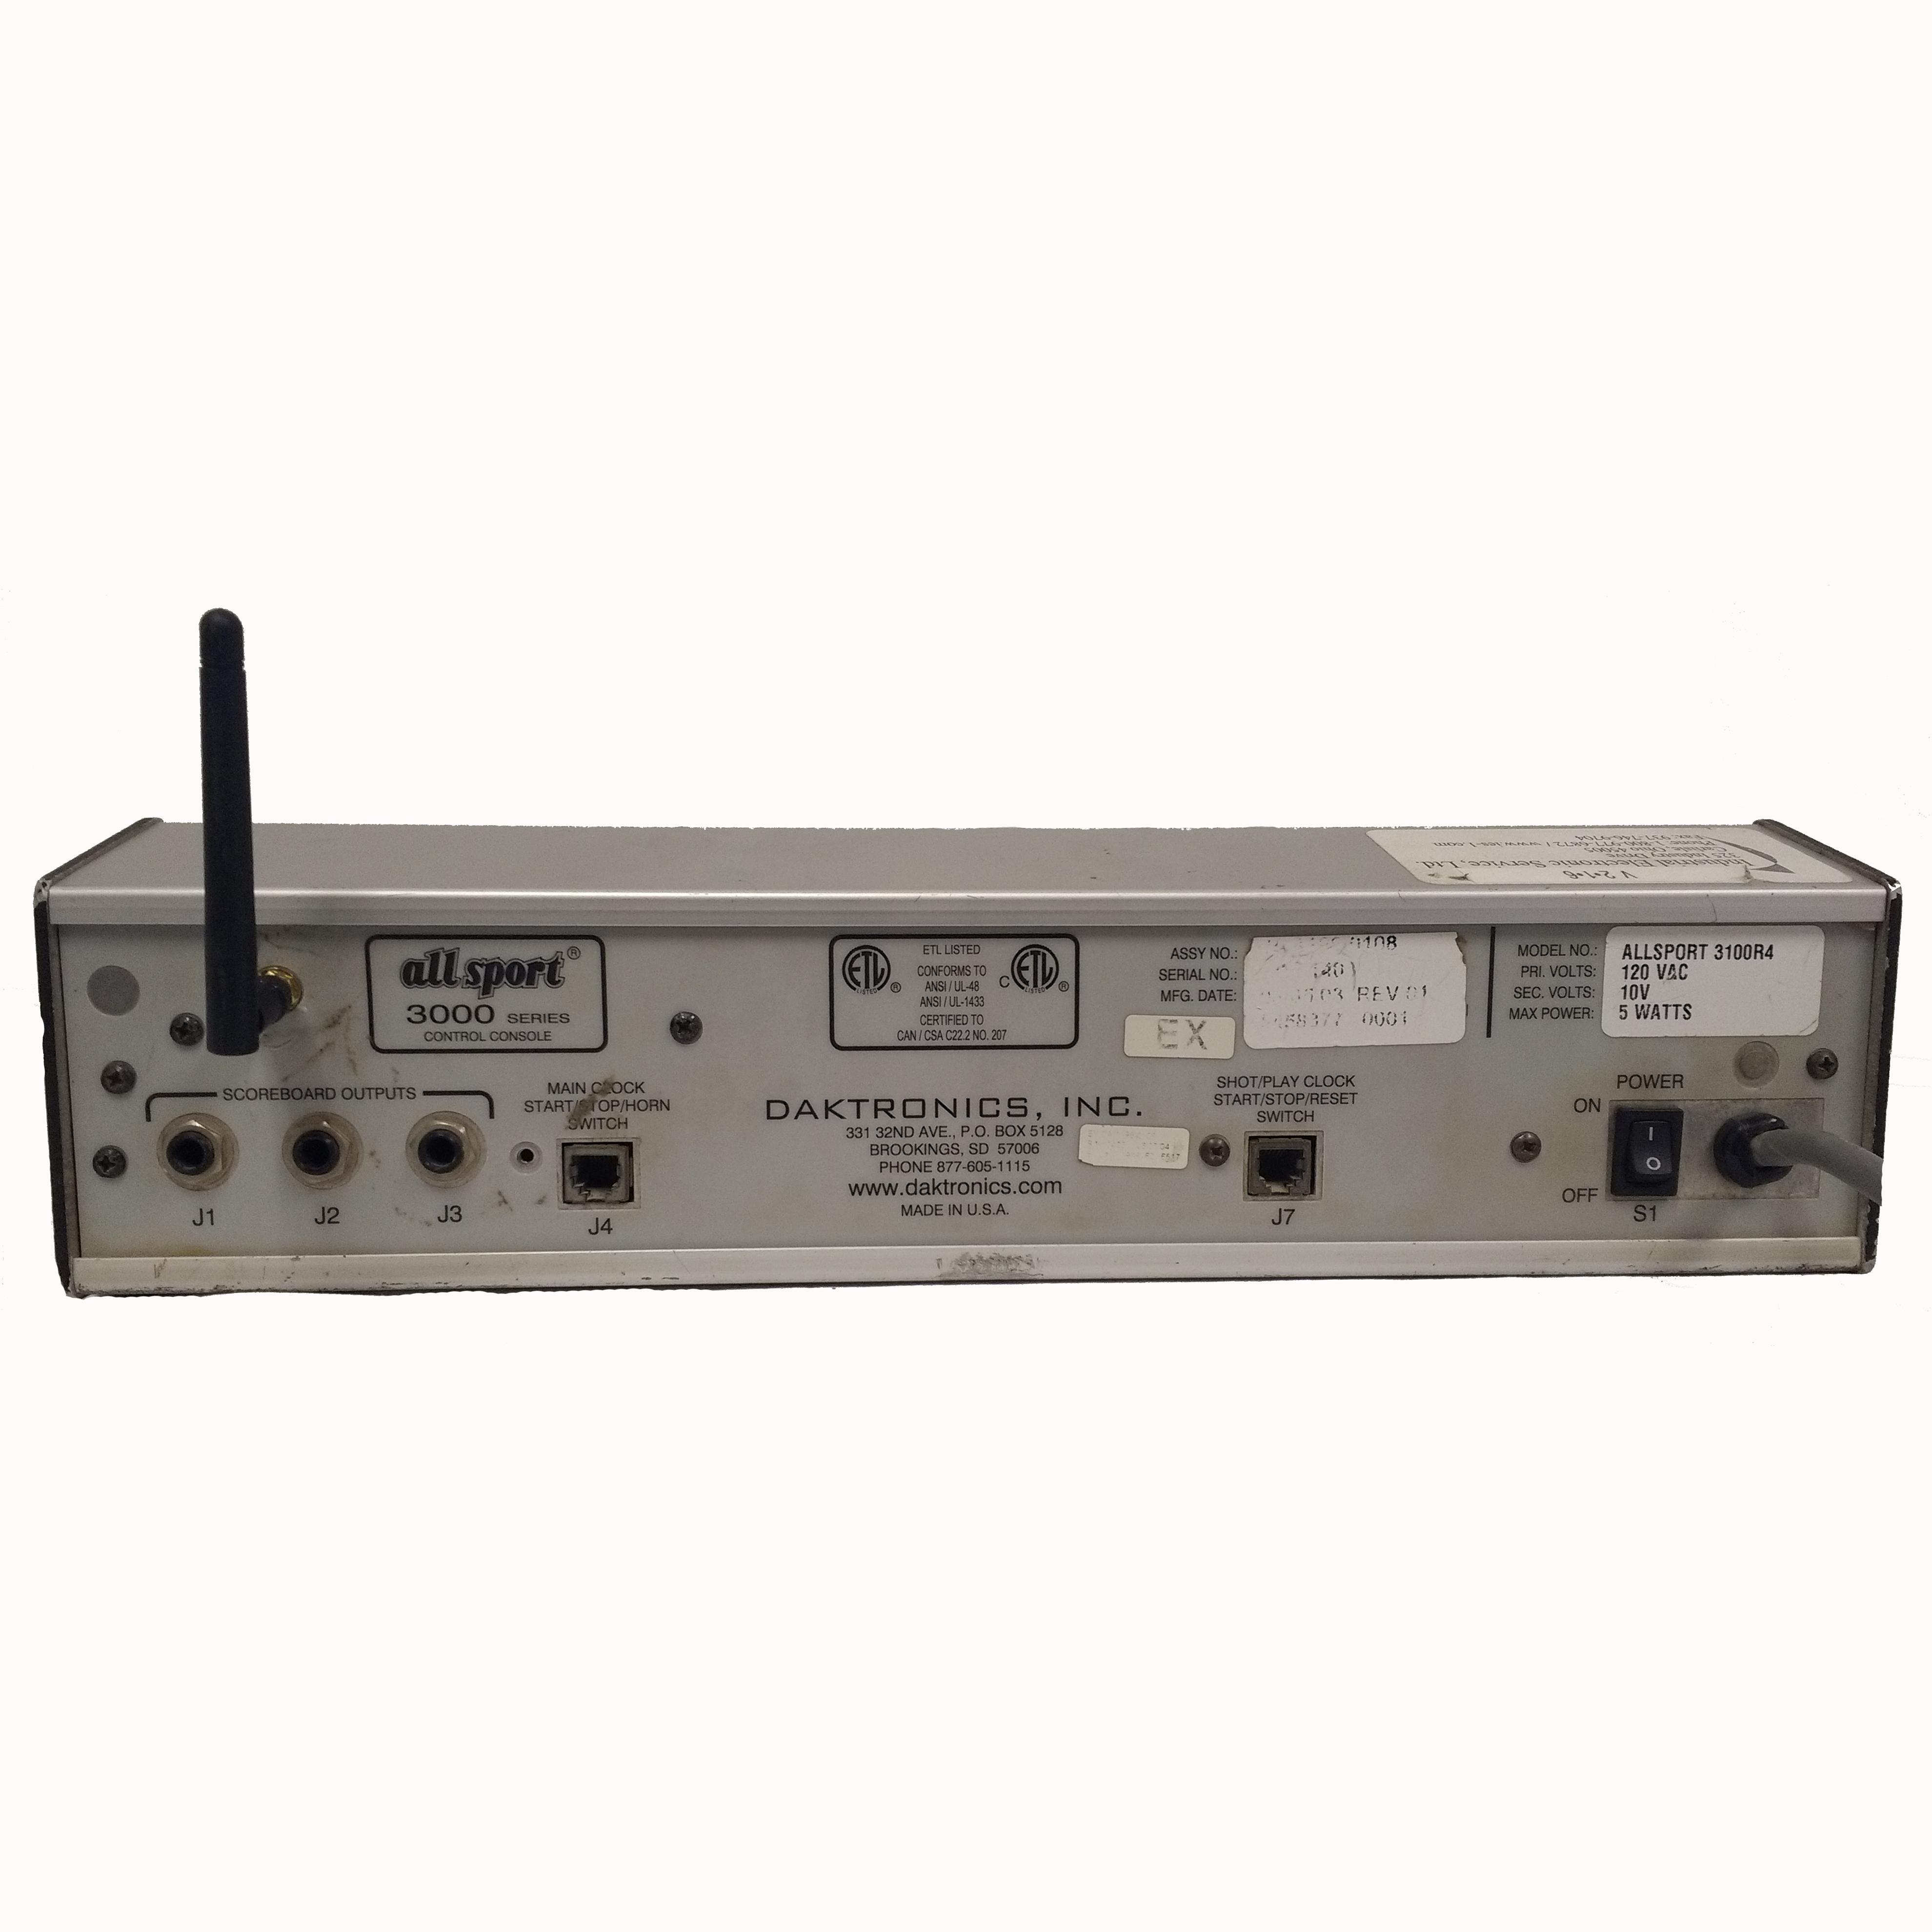 (0A-1196-0108) Daktronics All Sport 3000 Wireless GEN IV,V Controller (Refurbished) 1